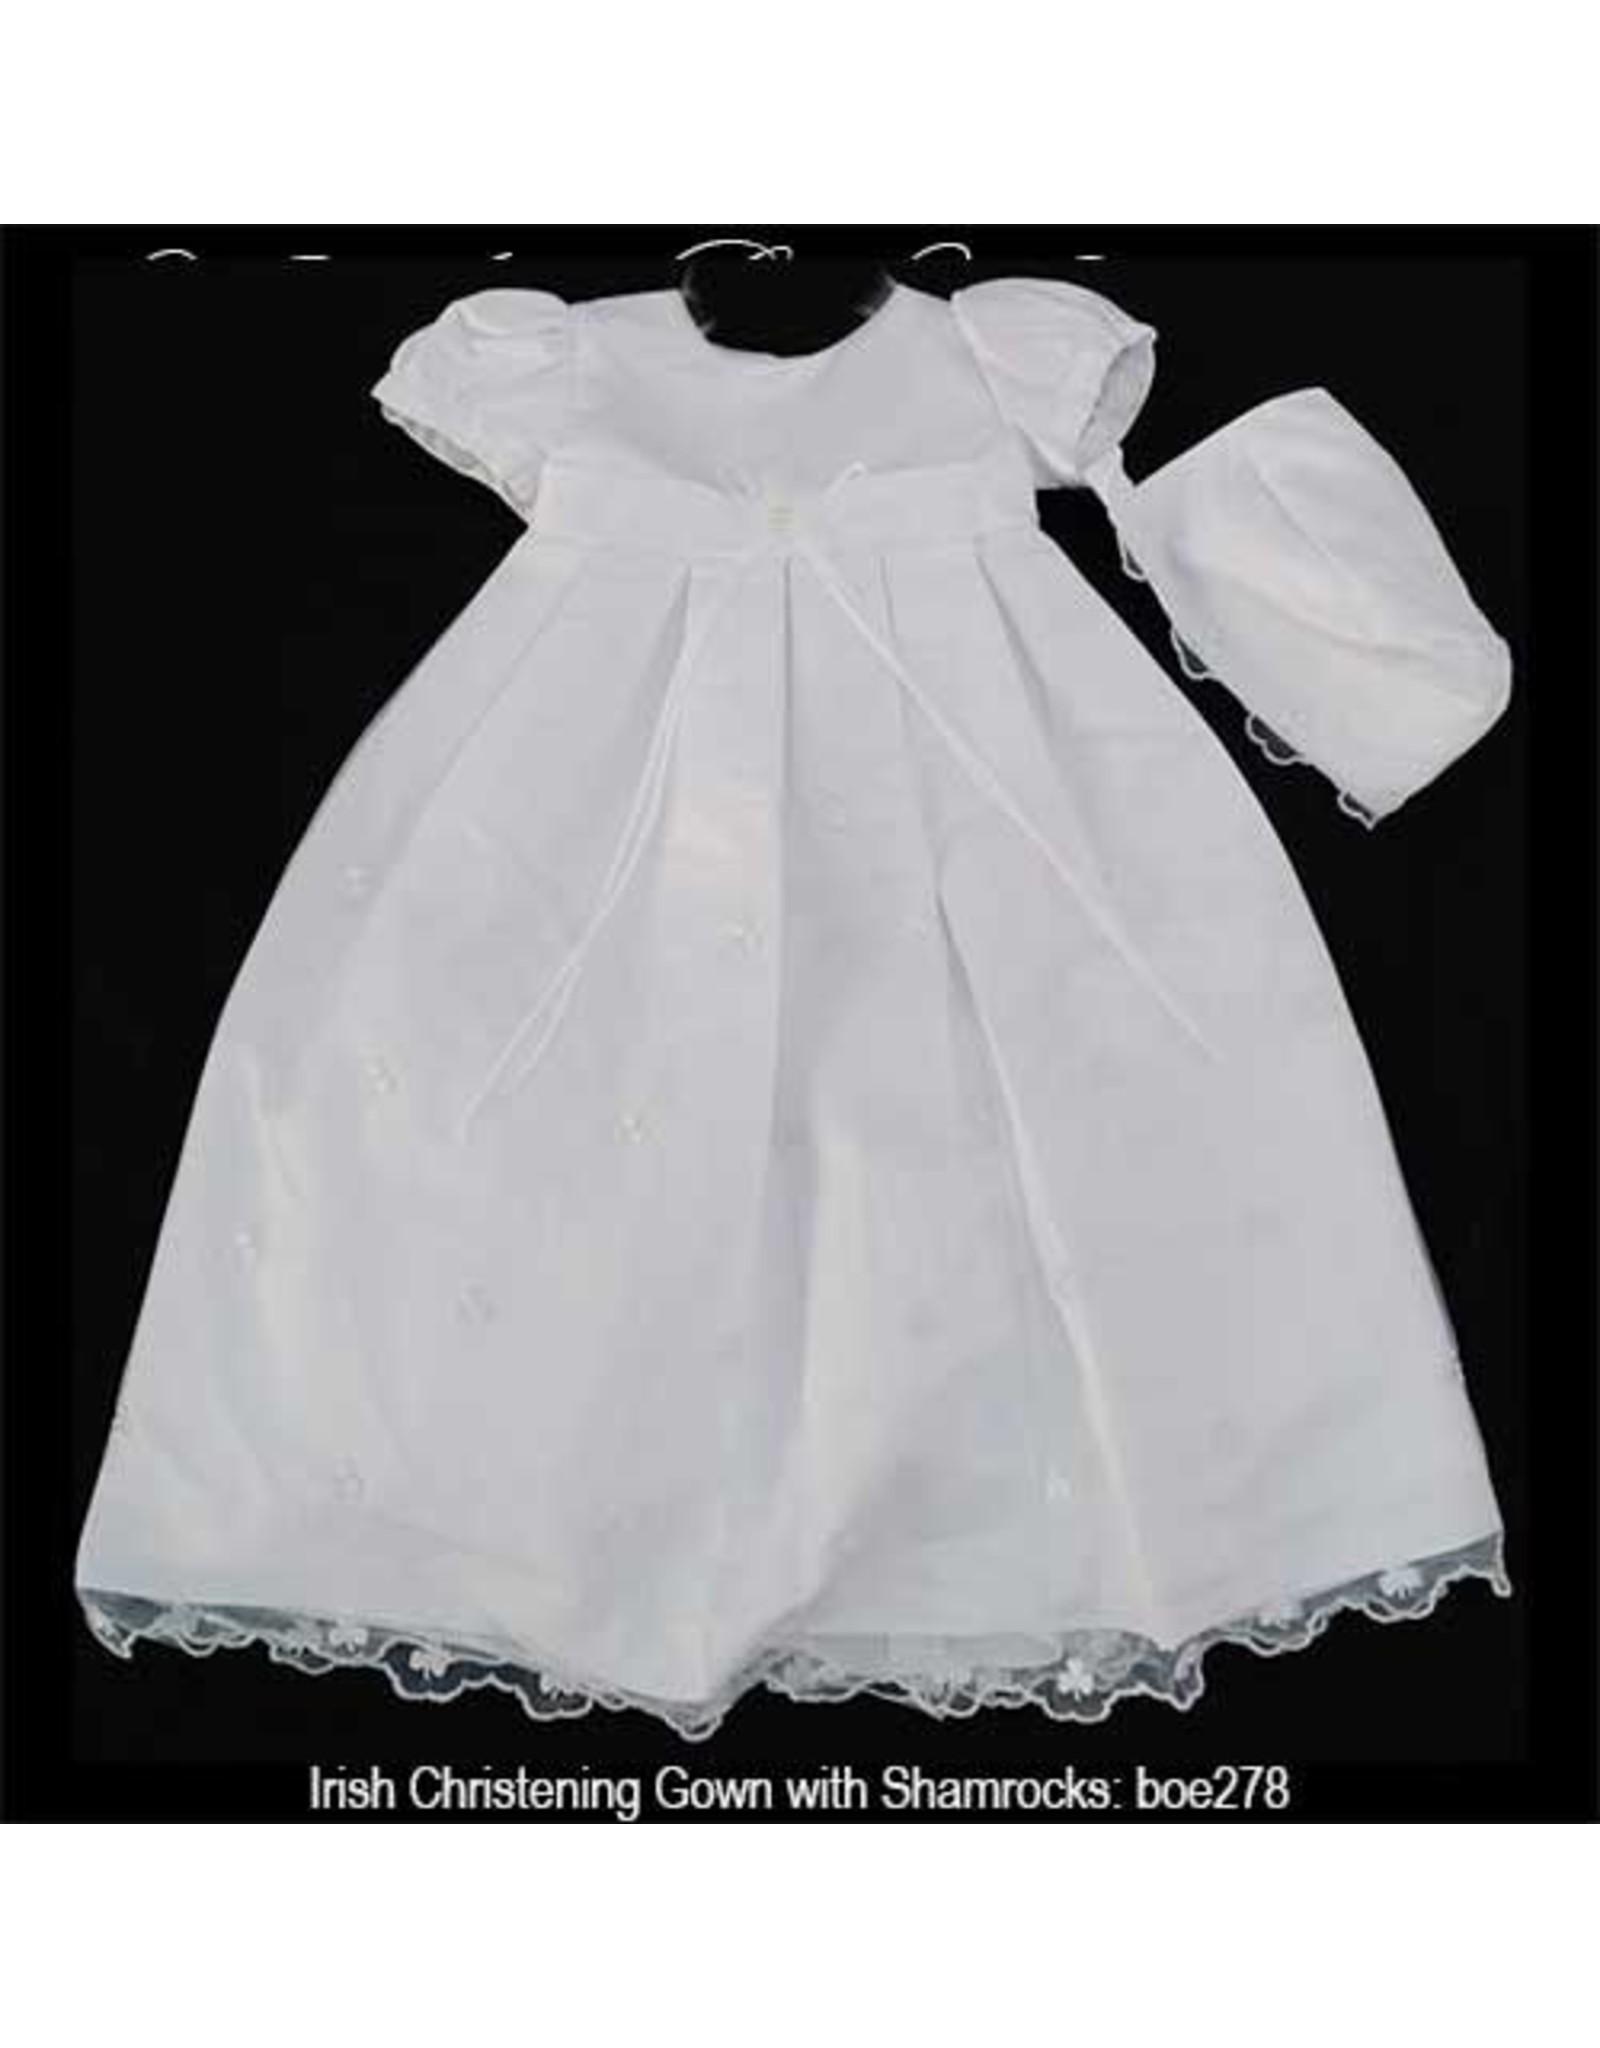 Bridgets of Erin Christening Gown w/Shamrocks